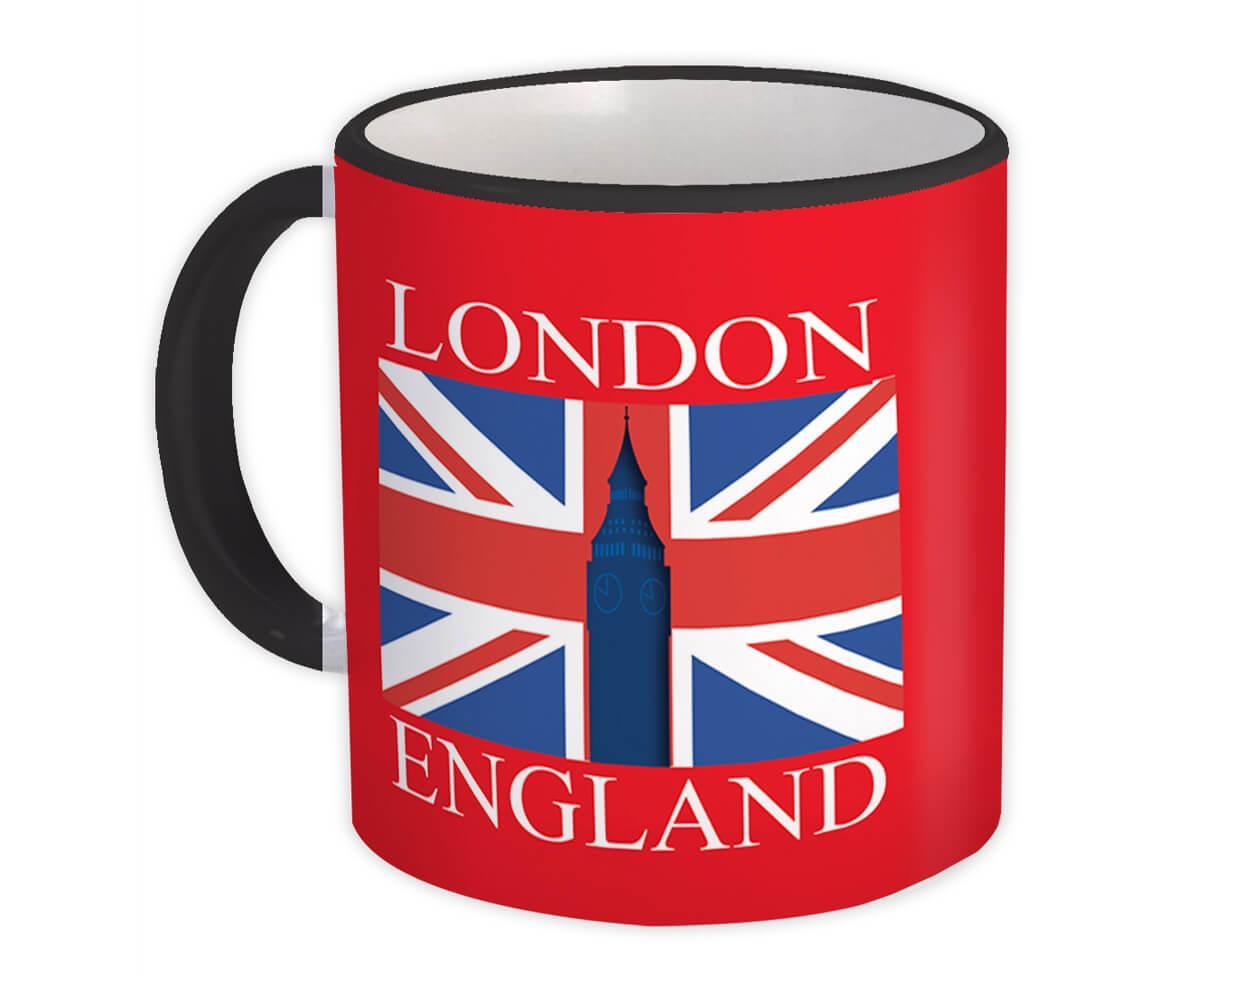 London England : Gift Mug Flag Country British Big Ben Tower Bridge